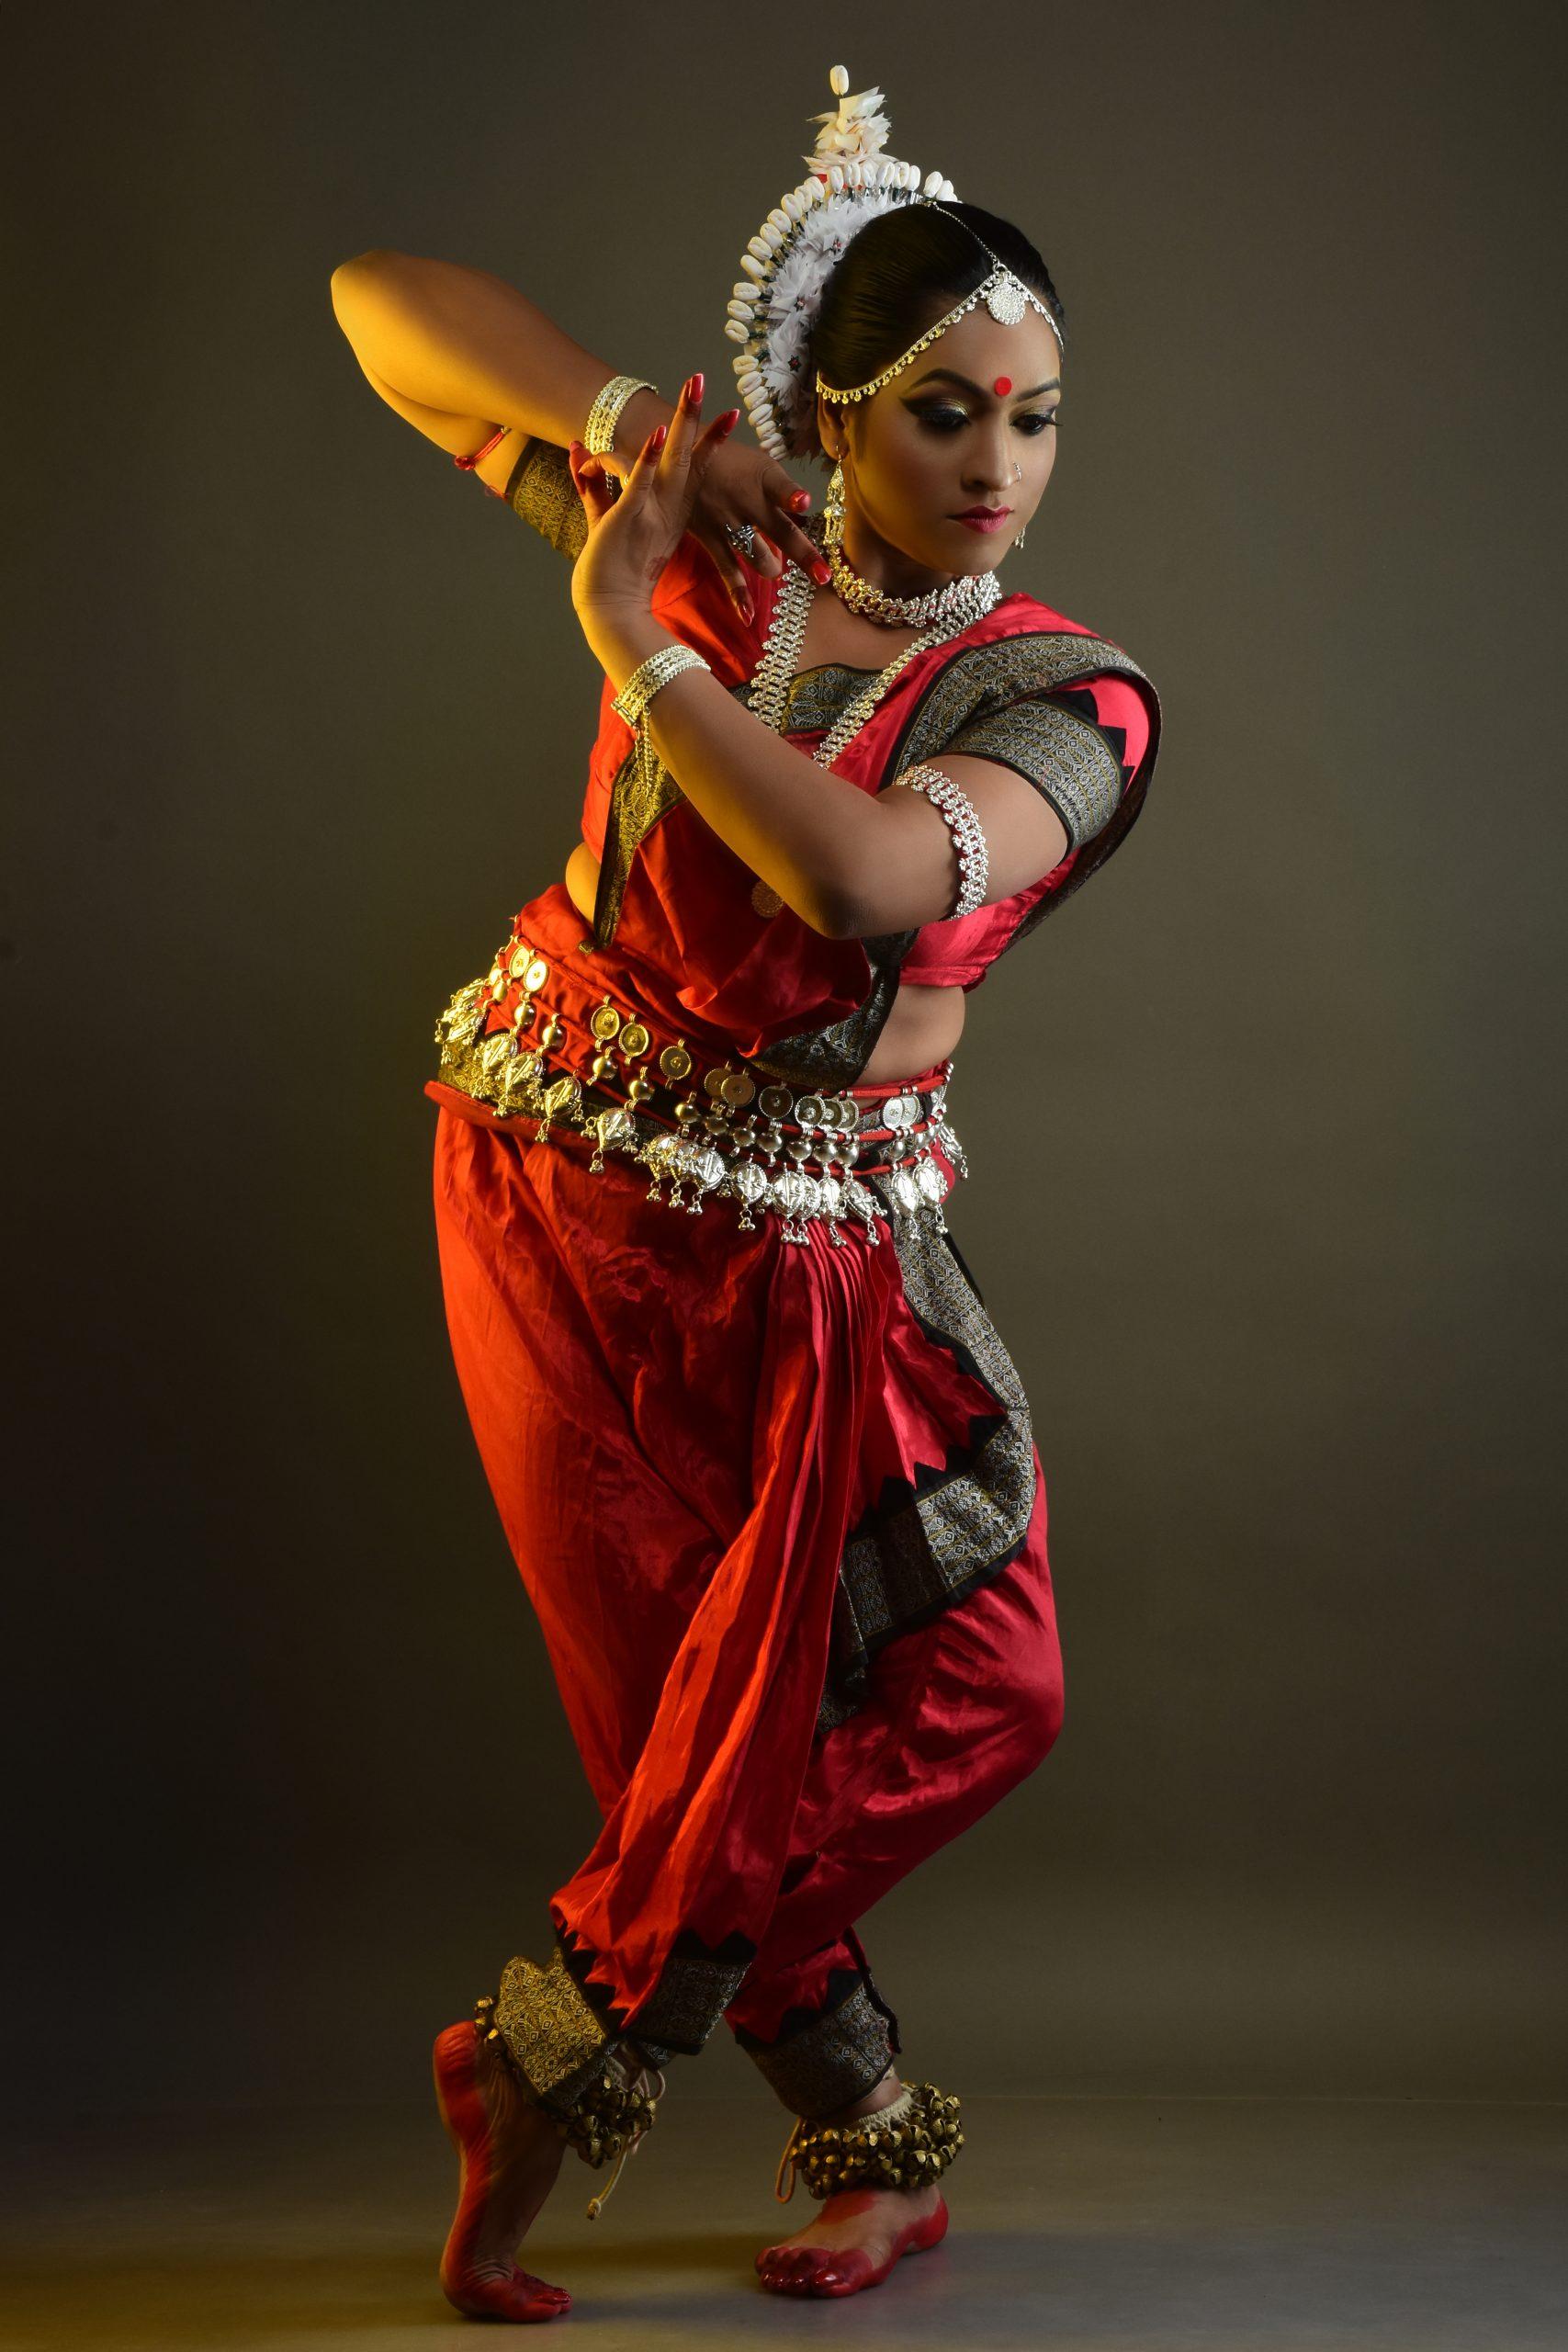 A female dance artist